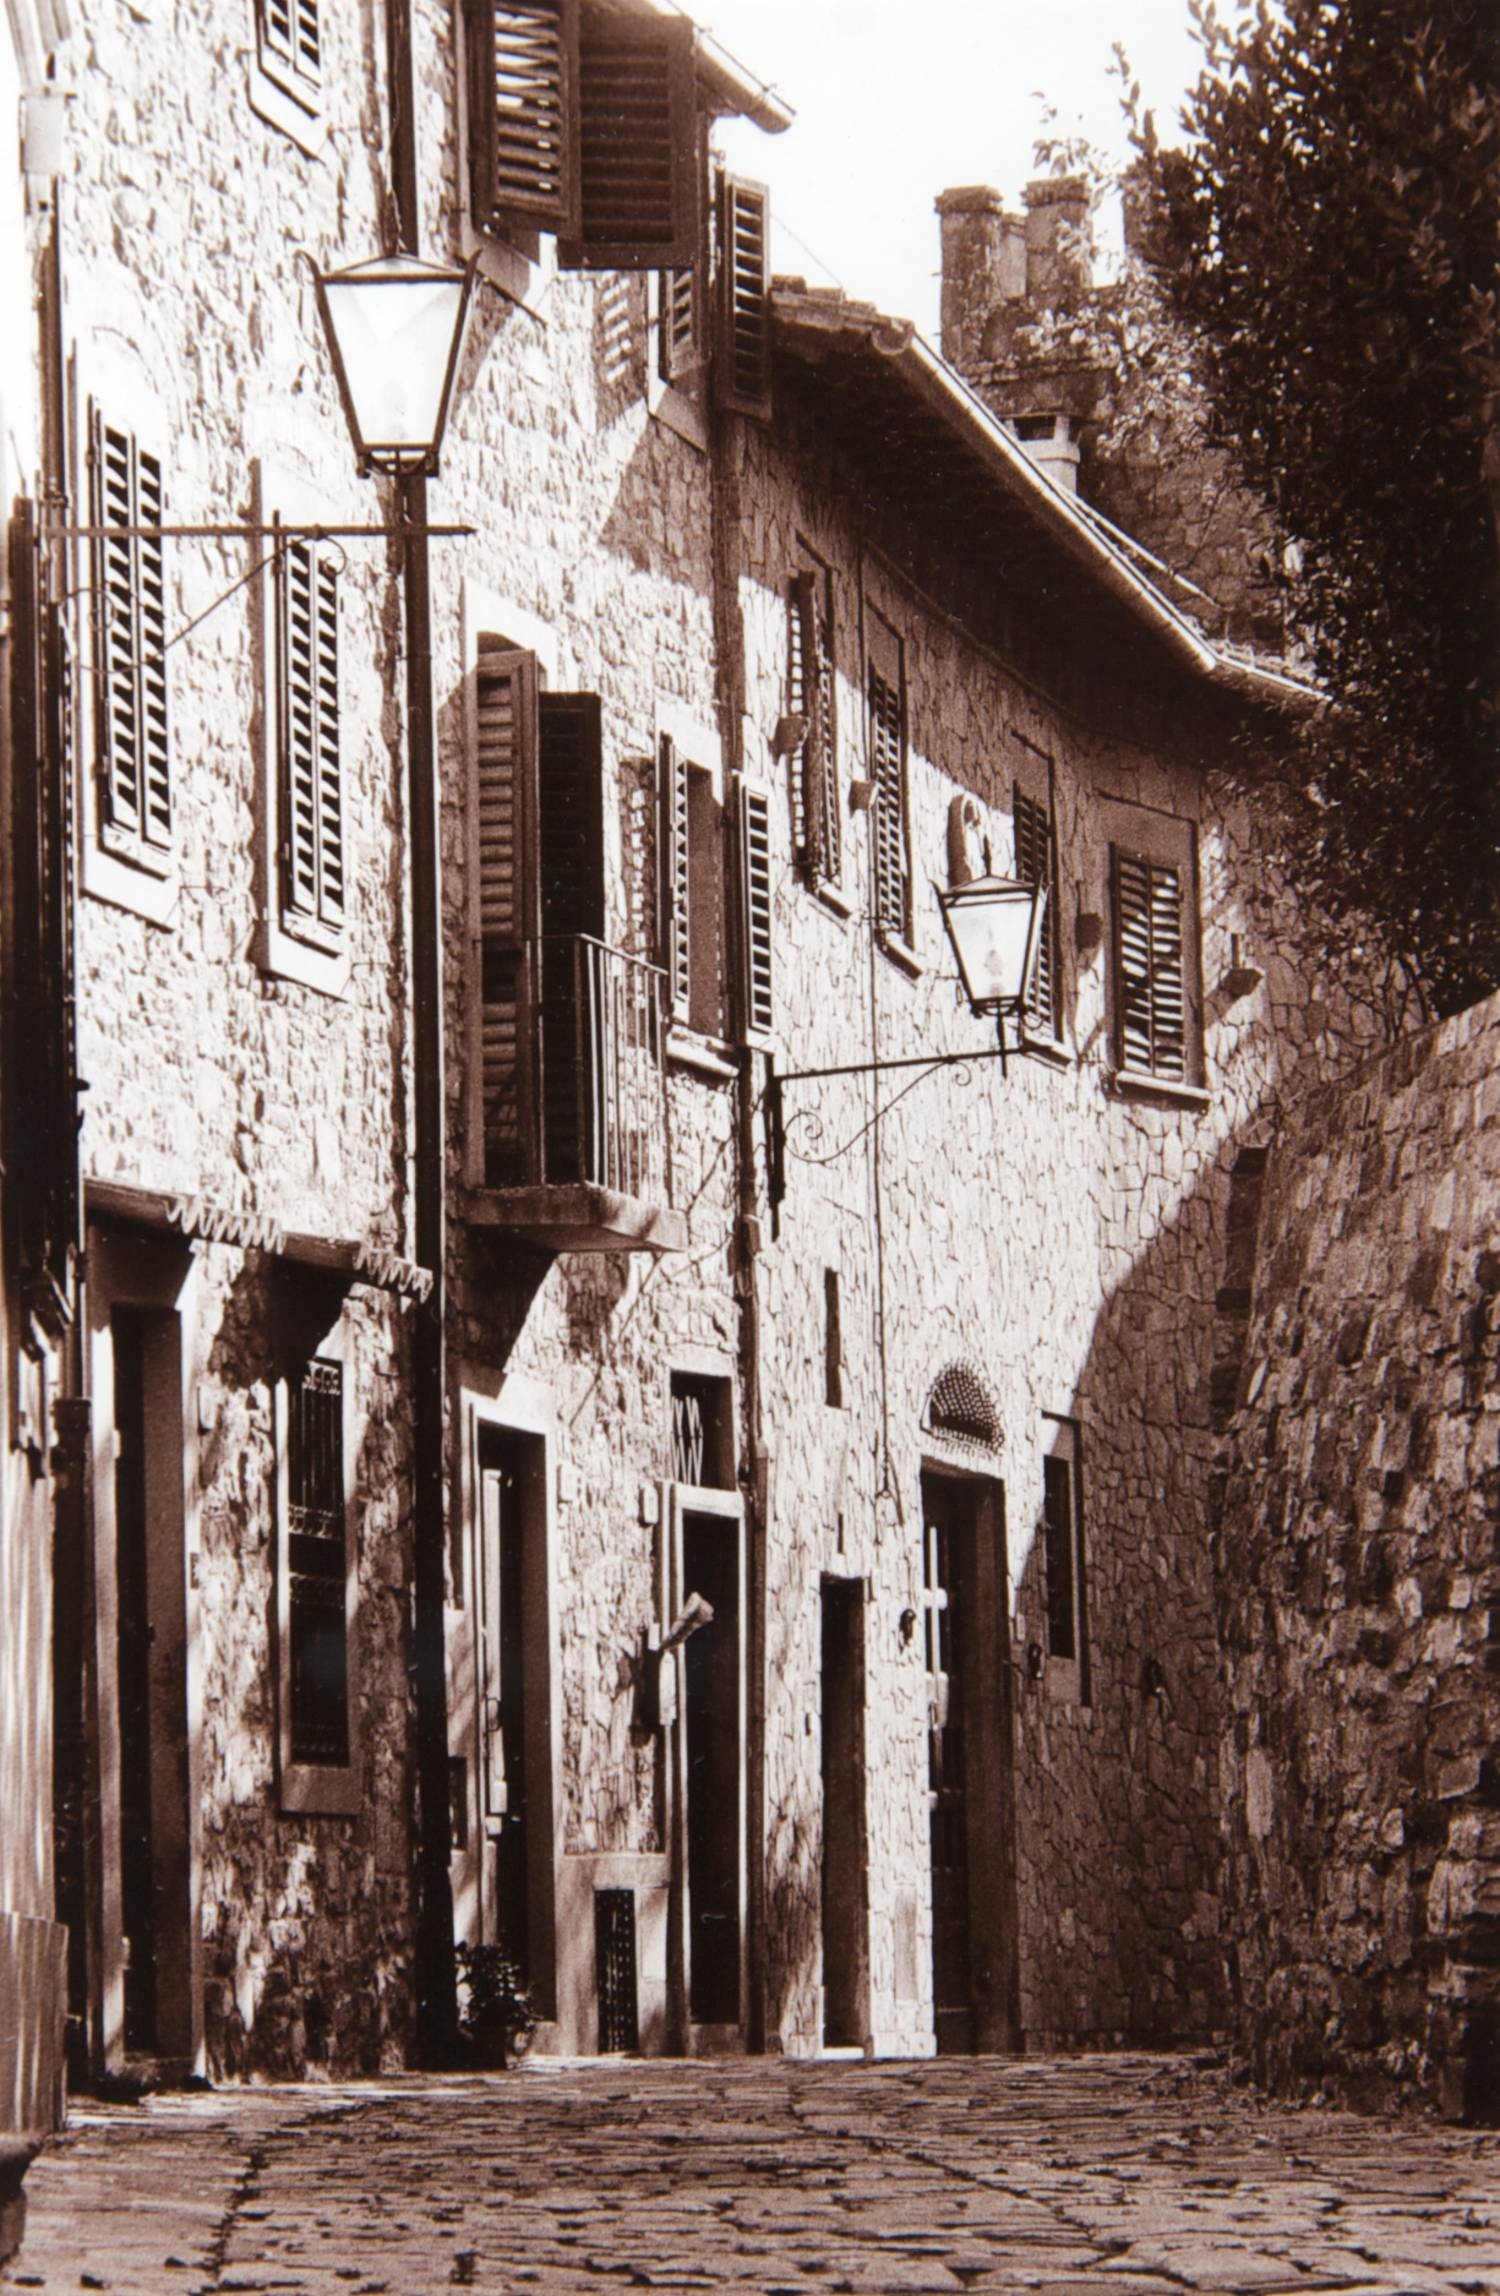 Street (Montefioralle in Chianti, Italy)